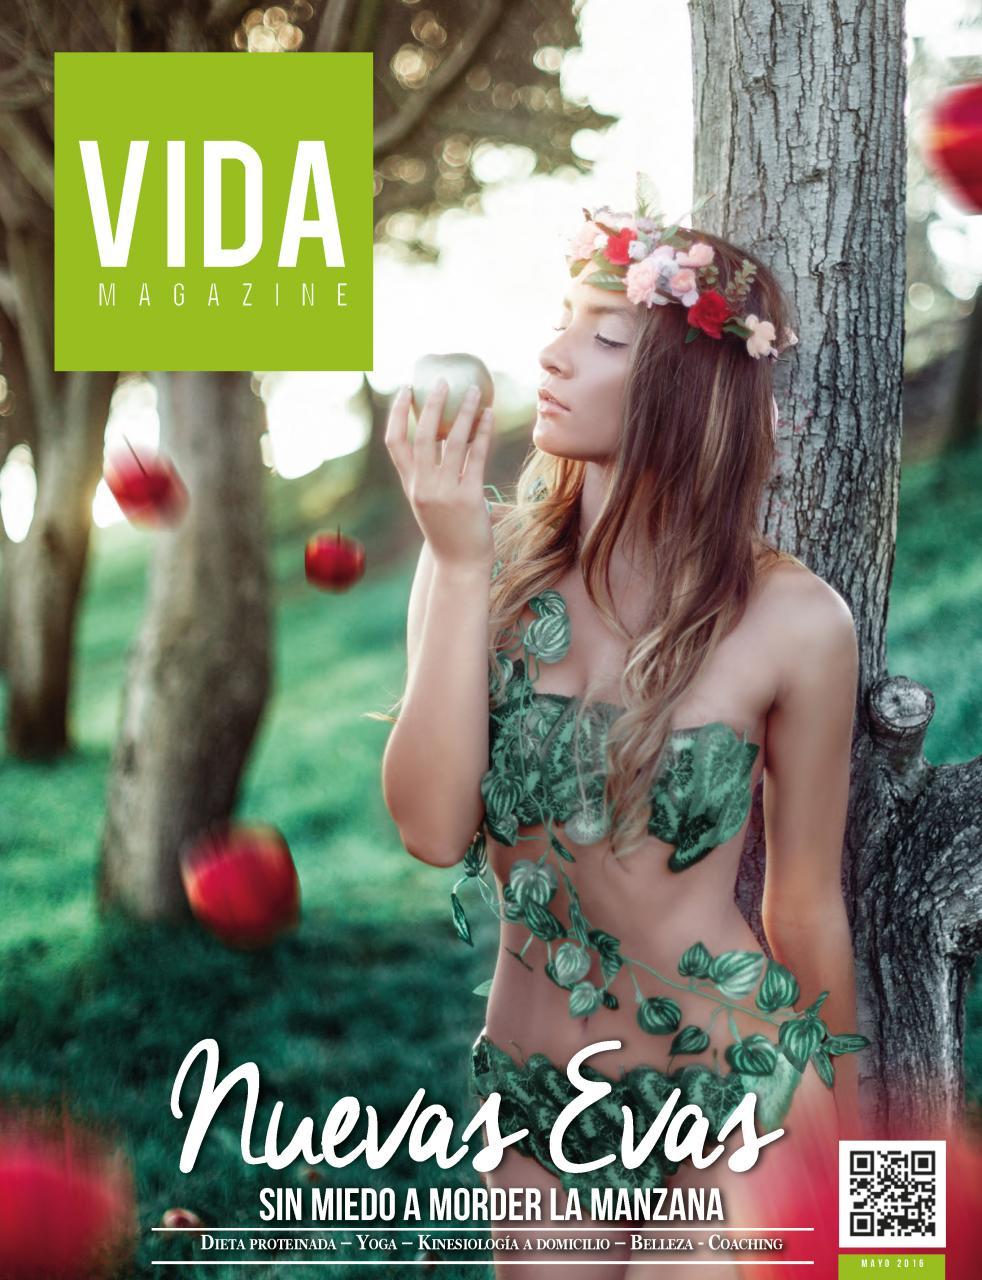 vida-magazine-edicion-n20